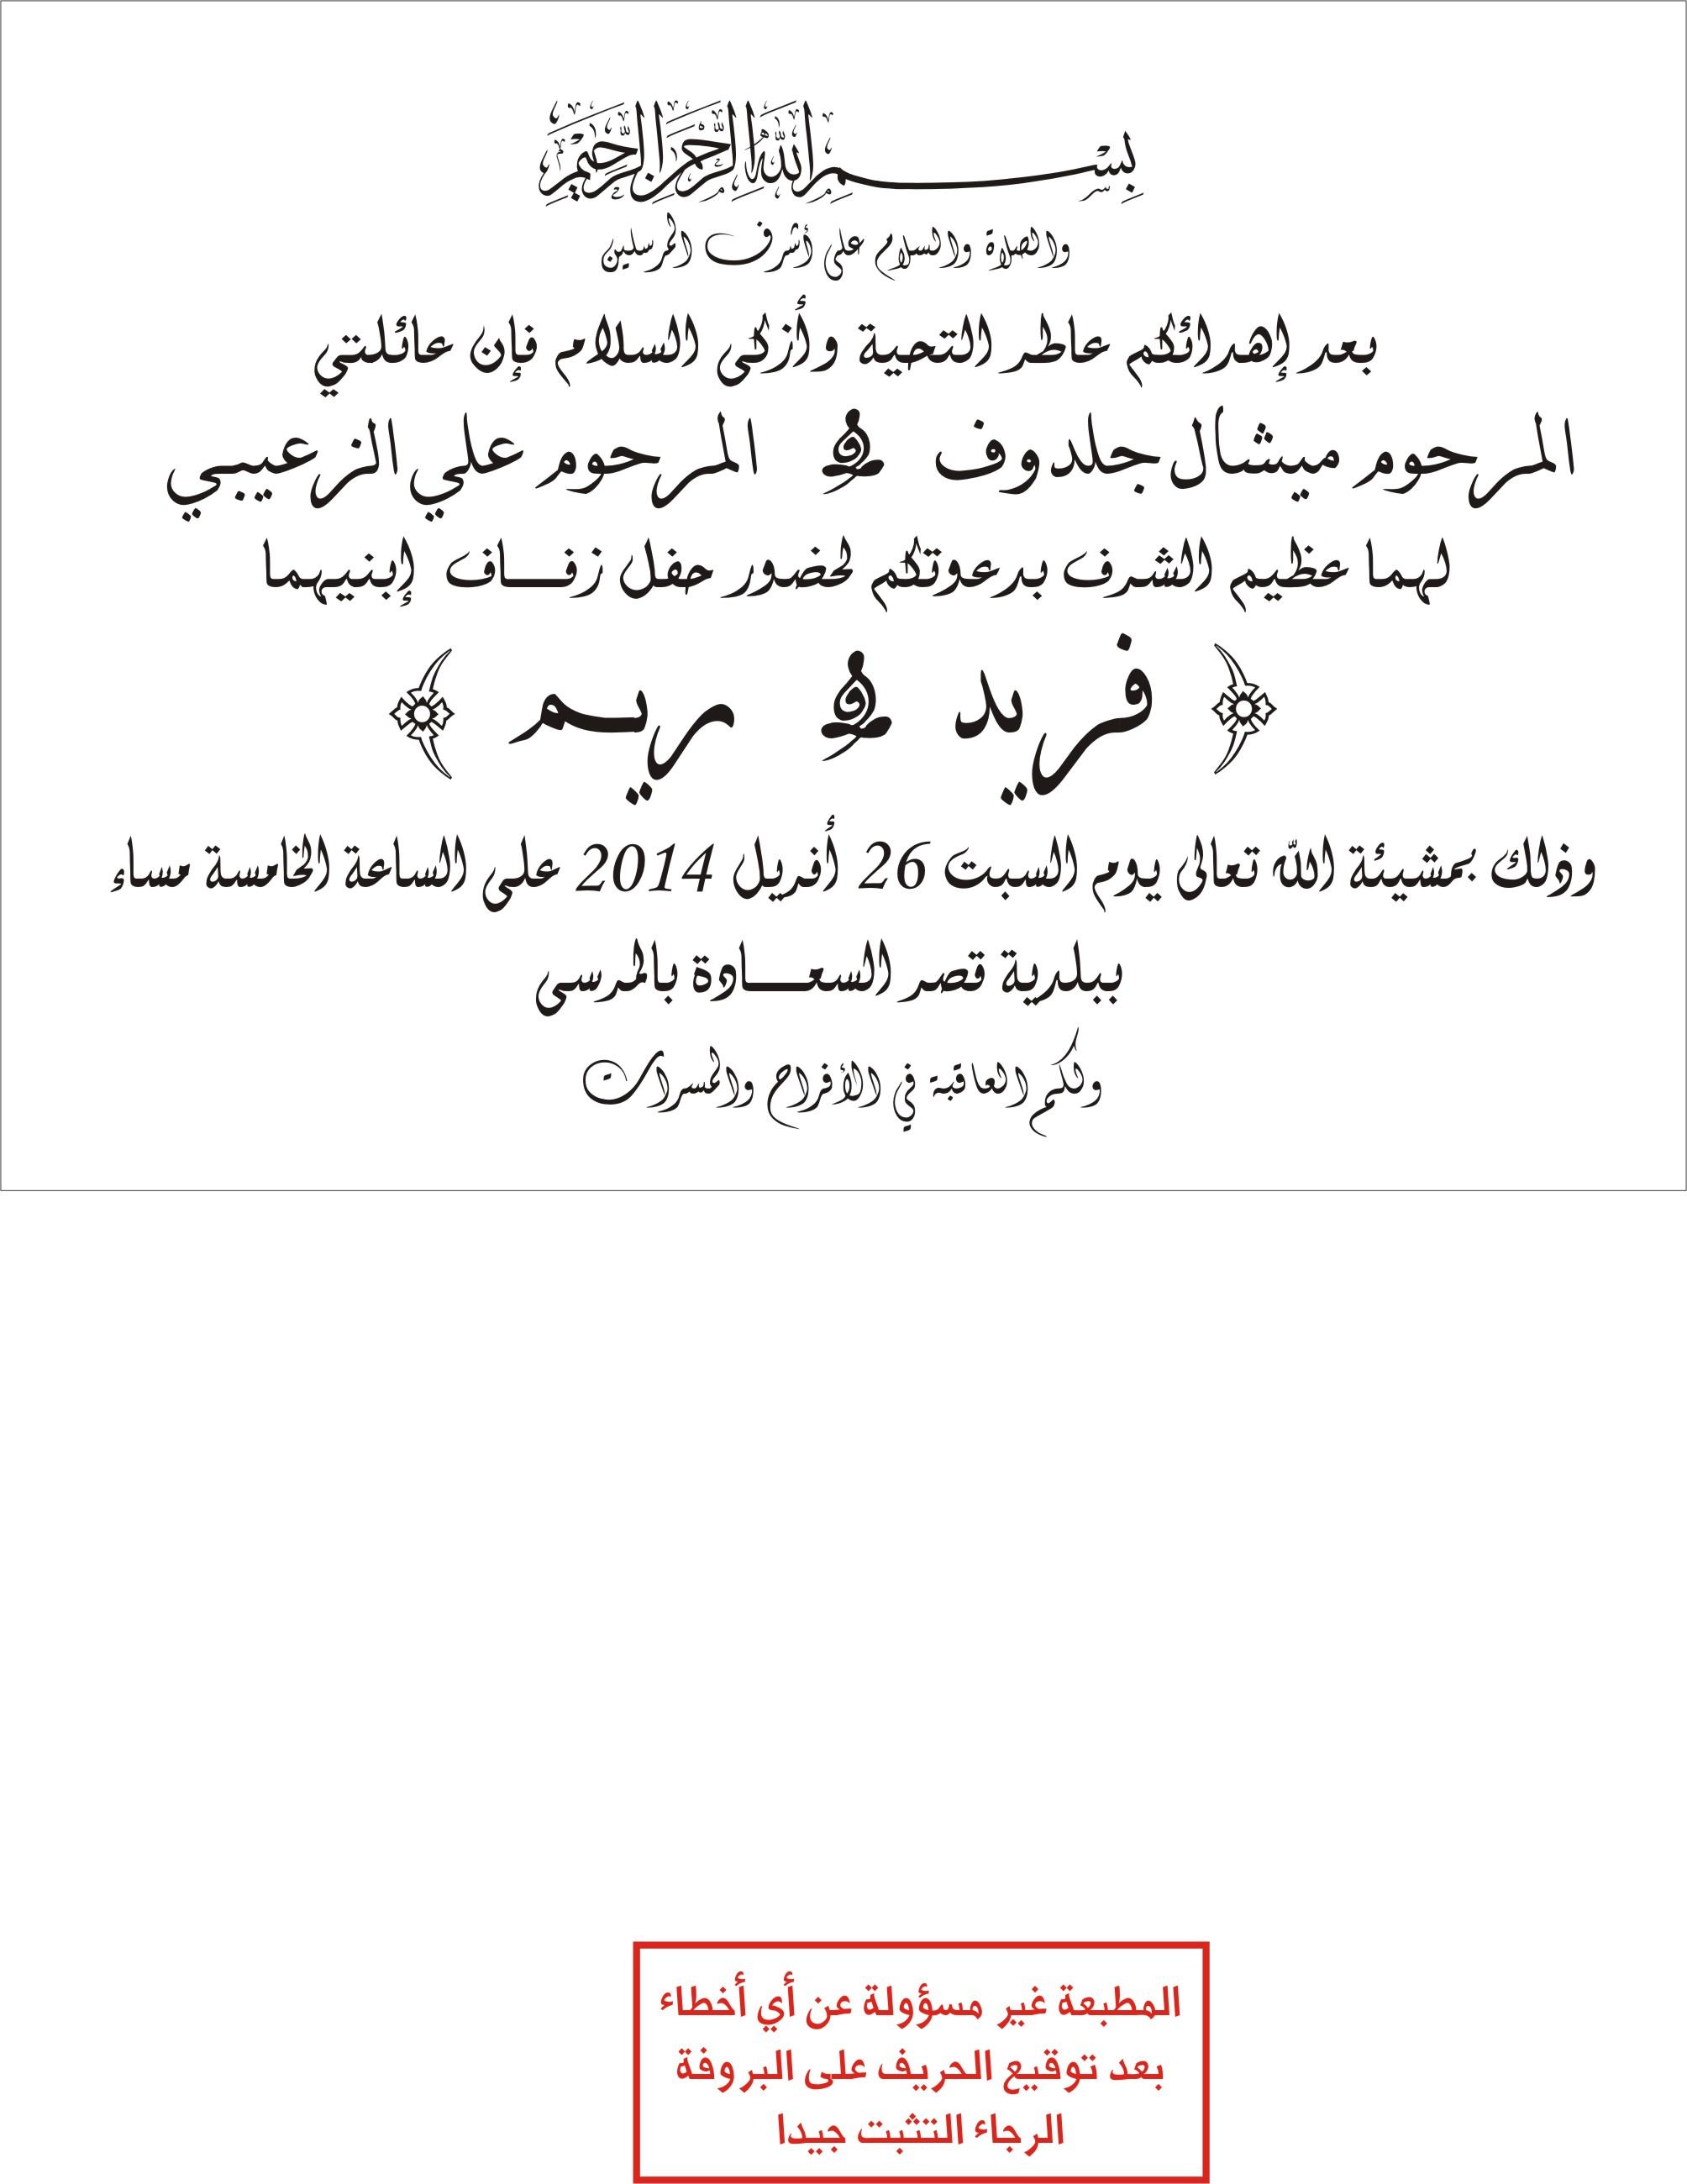 E D Invitation Mariage En Arabe Texte D Invitation De Mariage